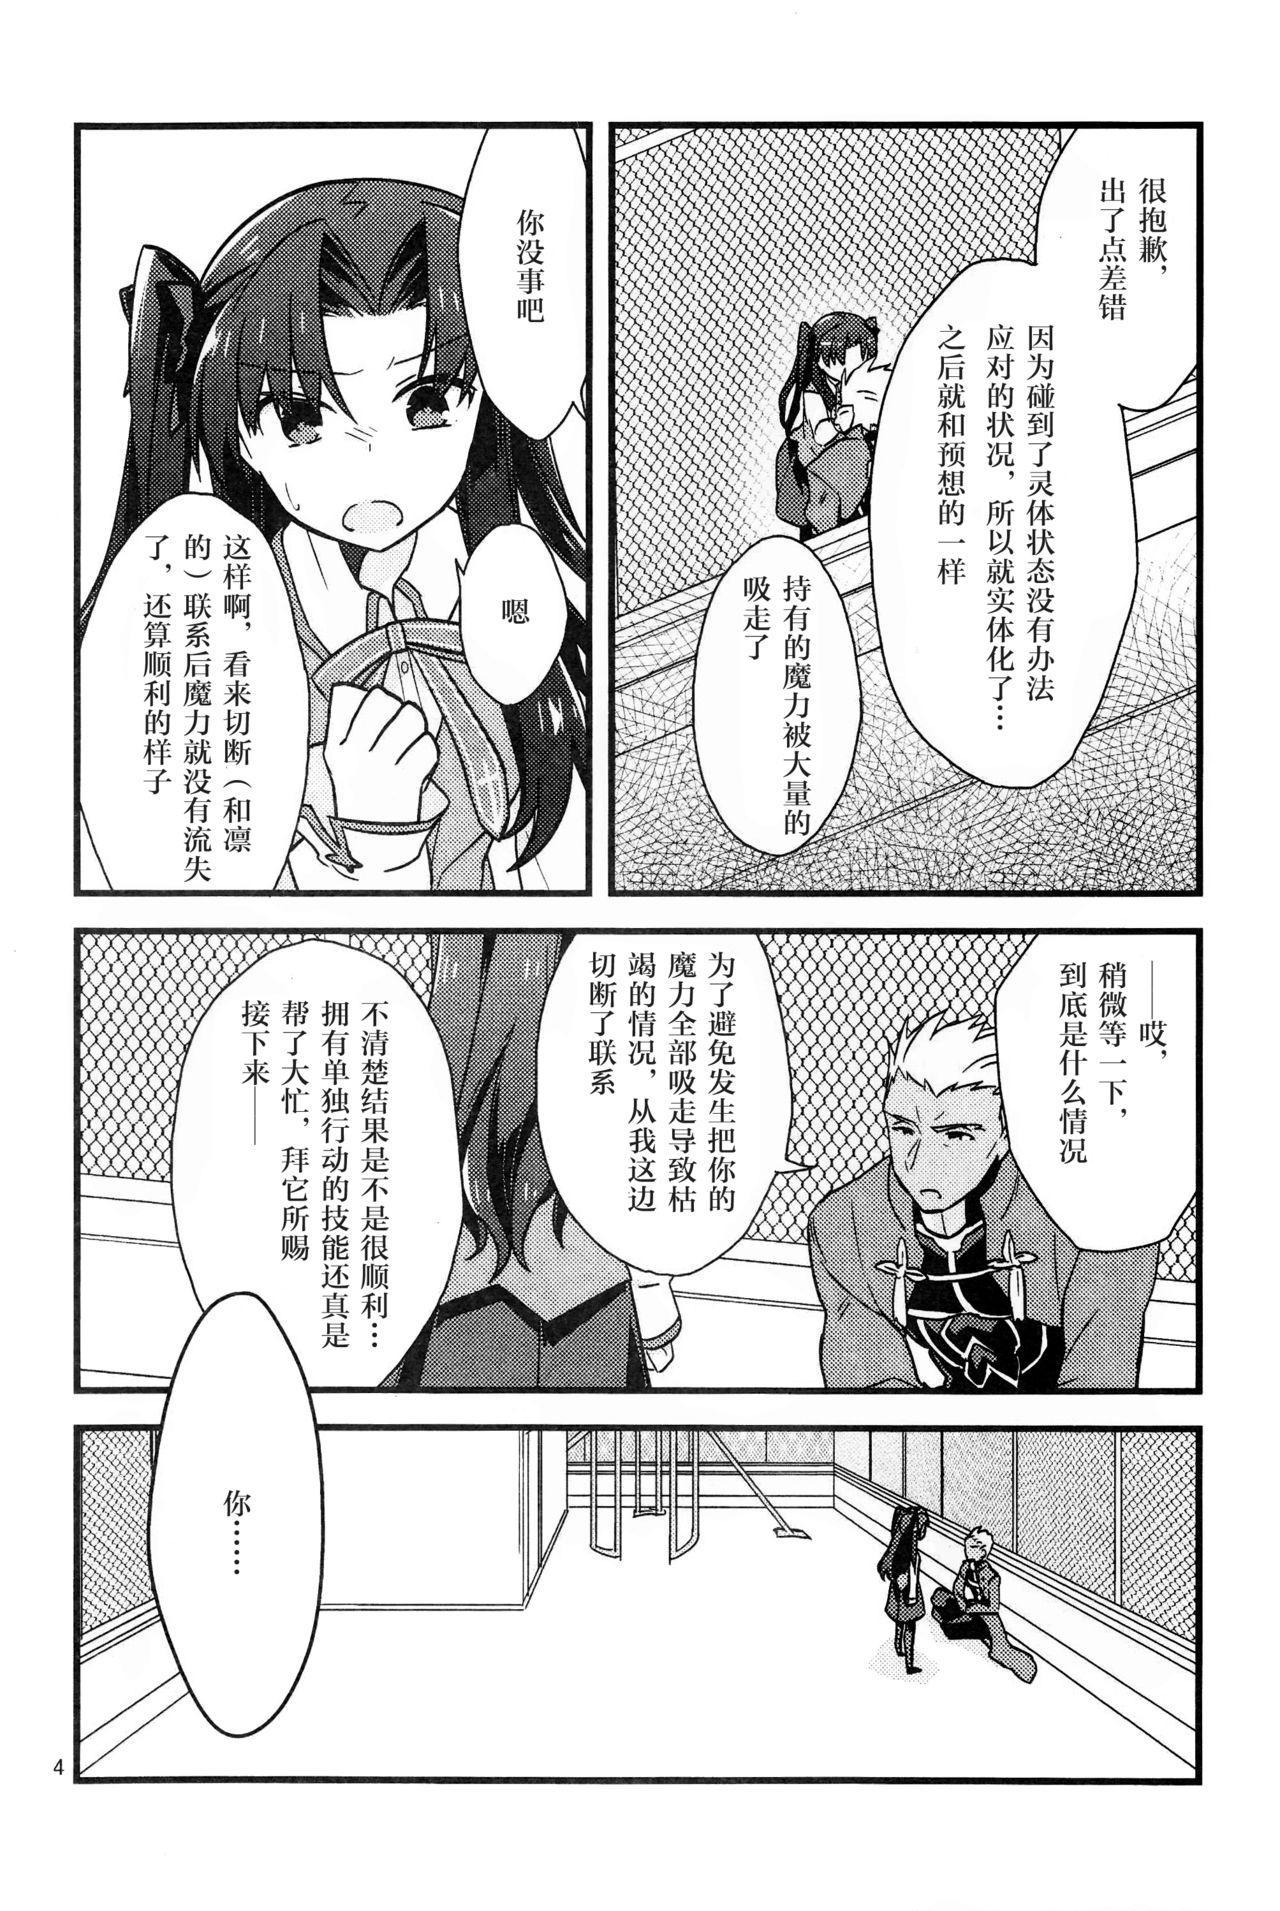 Masaka Ano Tosaka-san ga Jugyouchuu ni 2